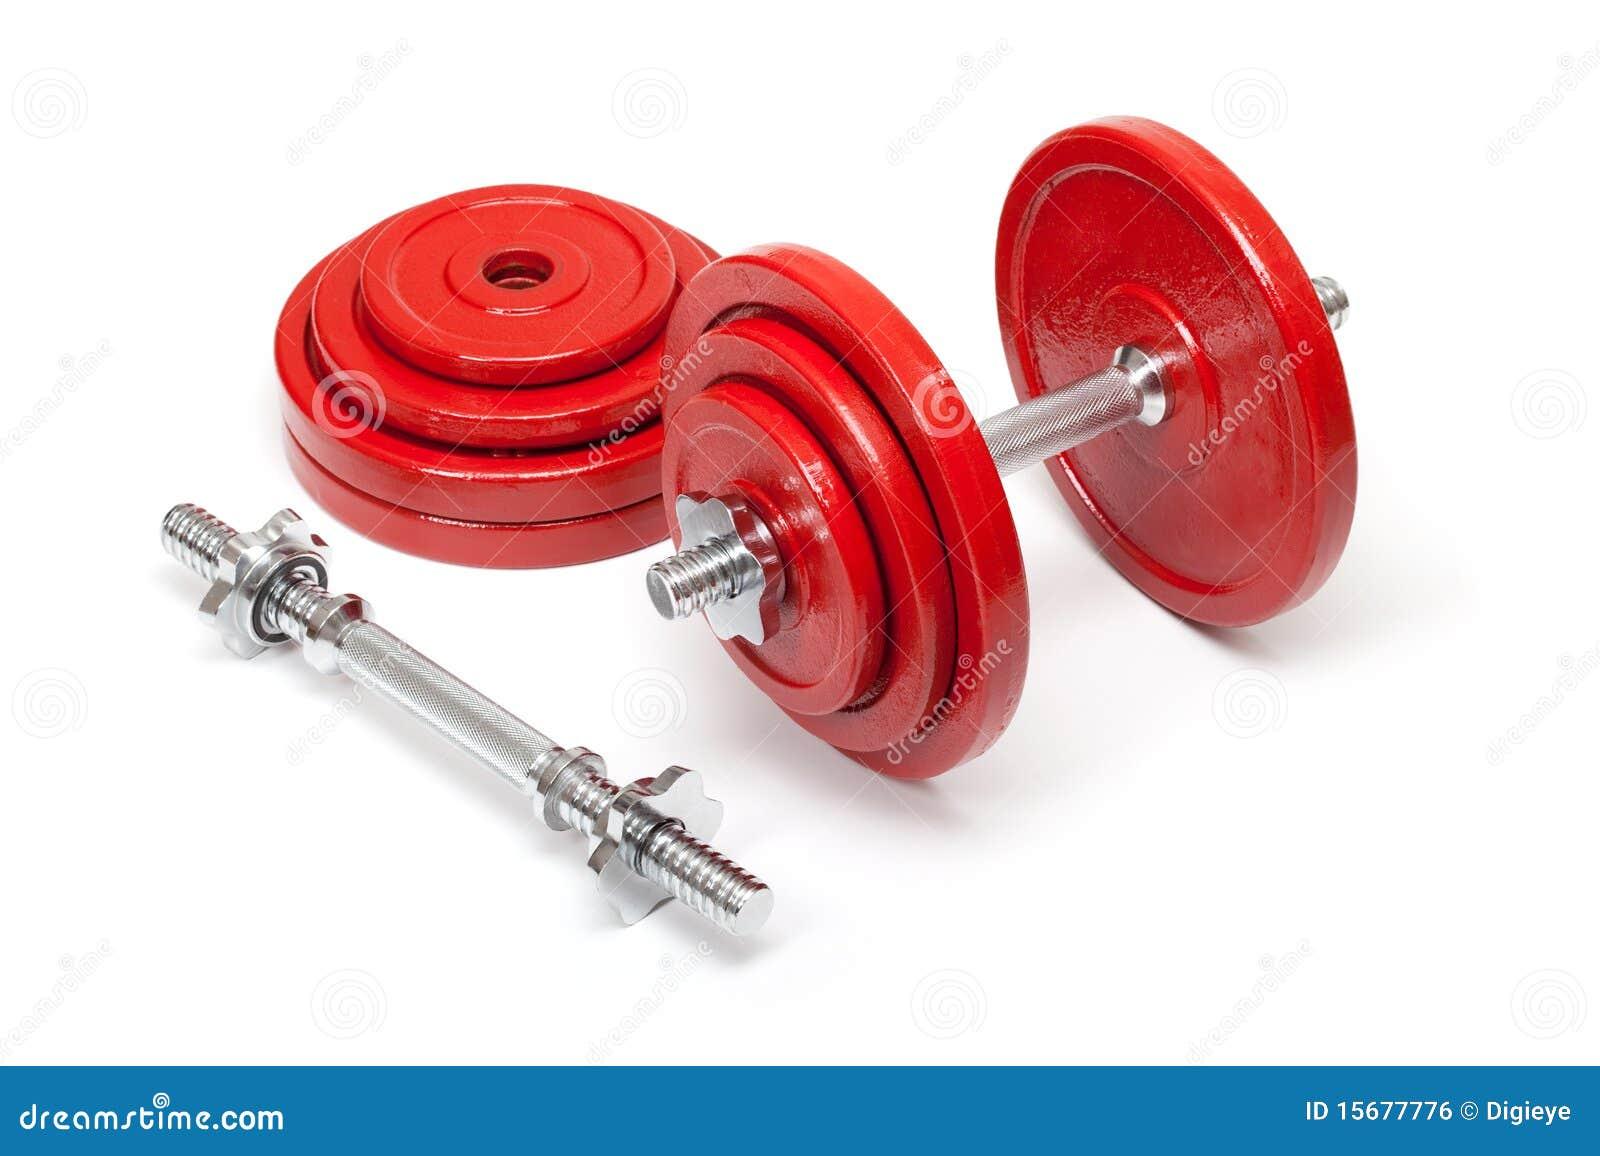 Dumbbells for body building